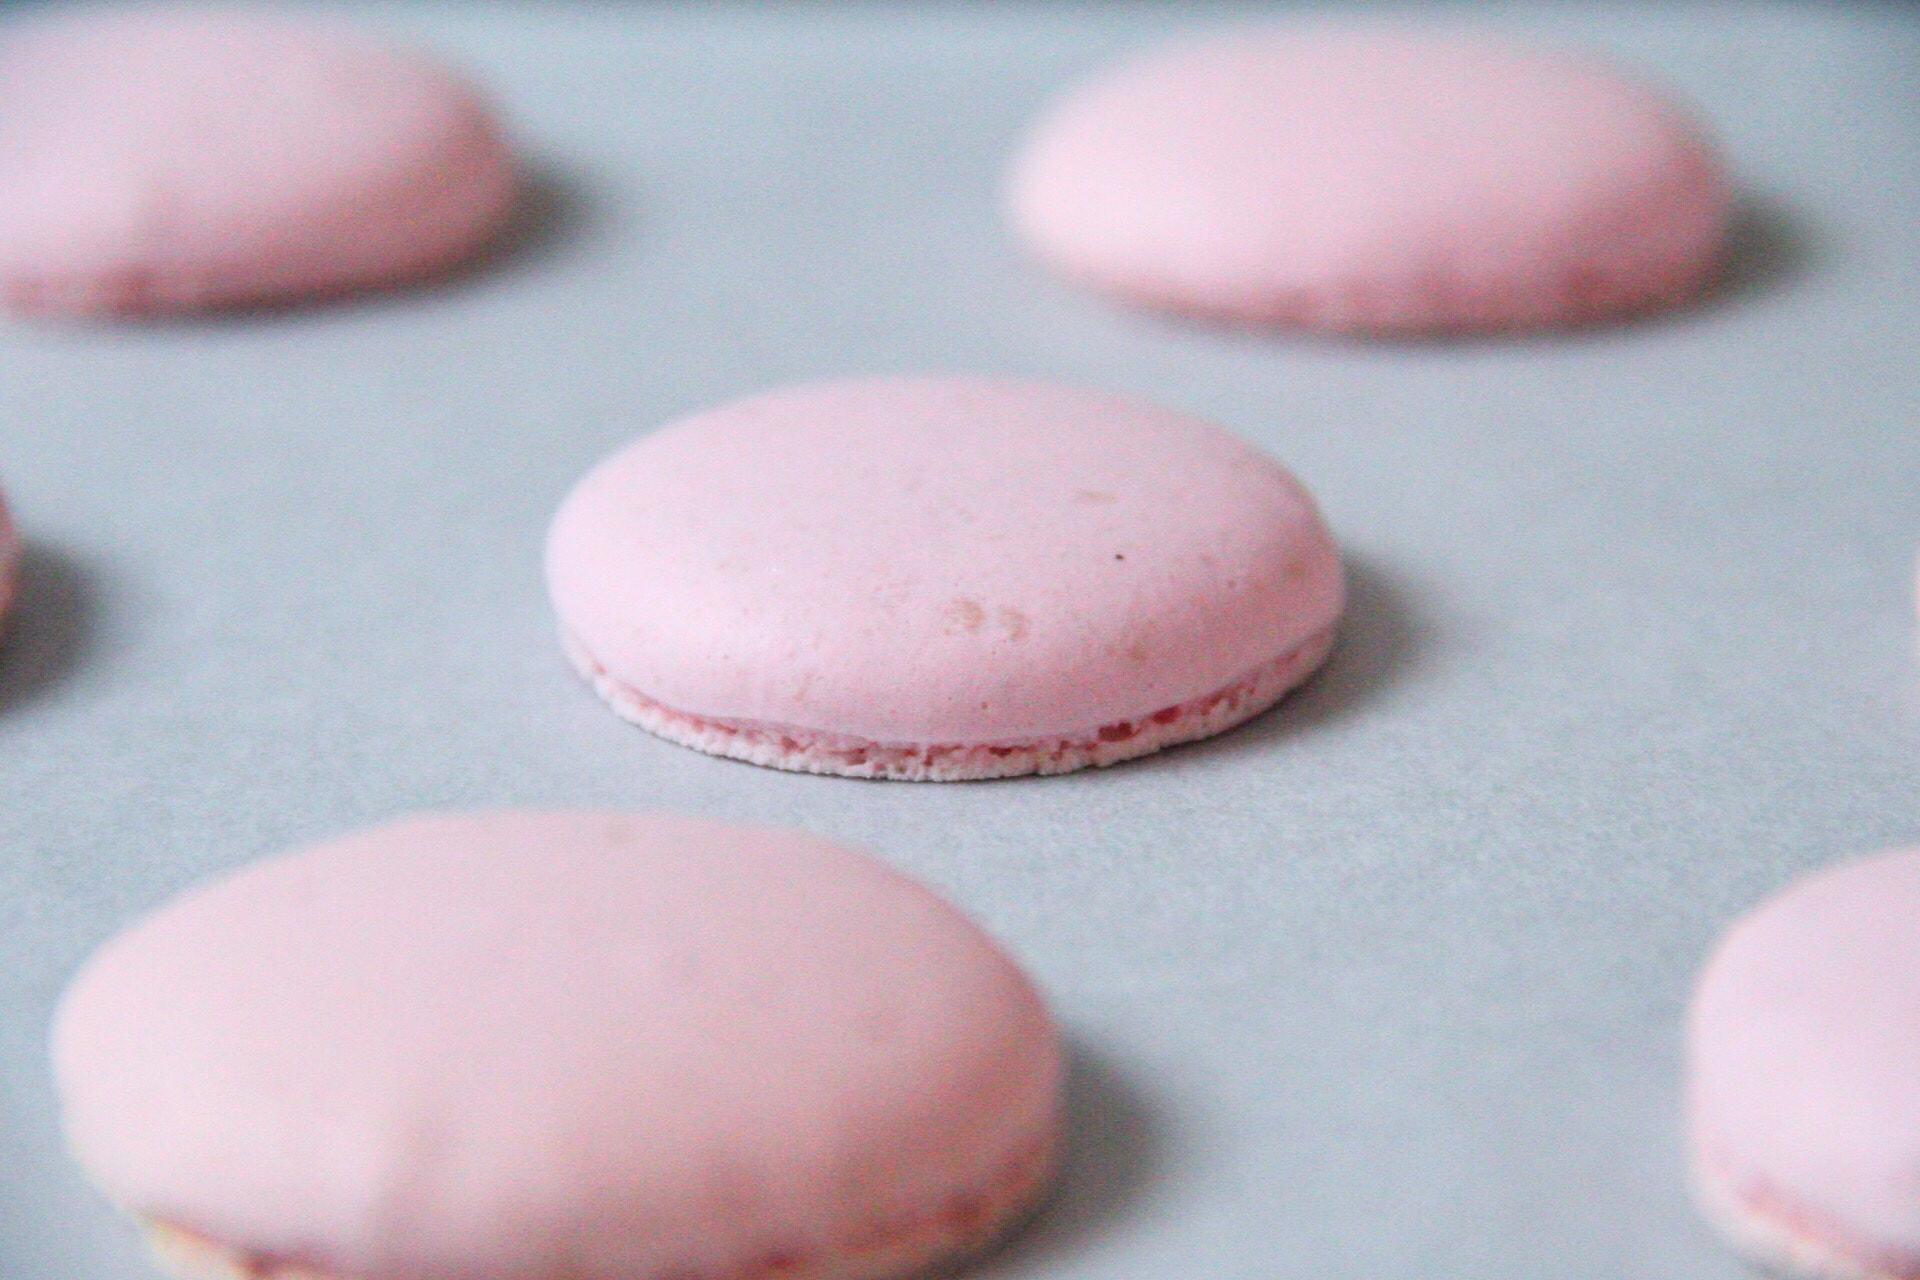 exif temp image 2 - Recept macarons van Piere Hermé